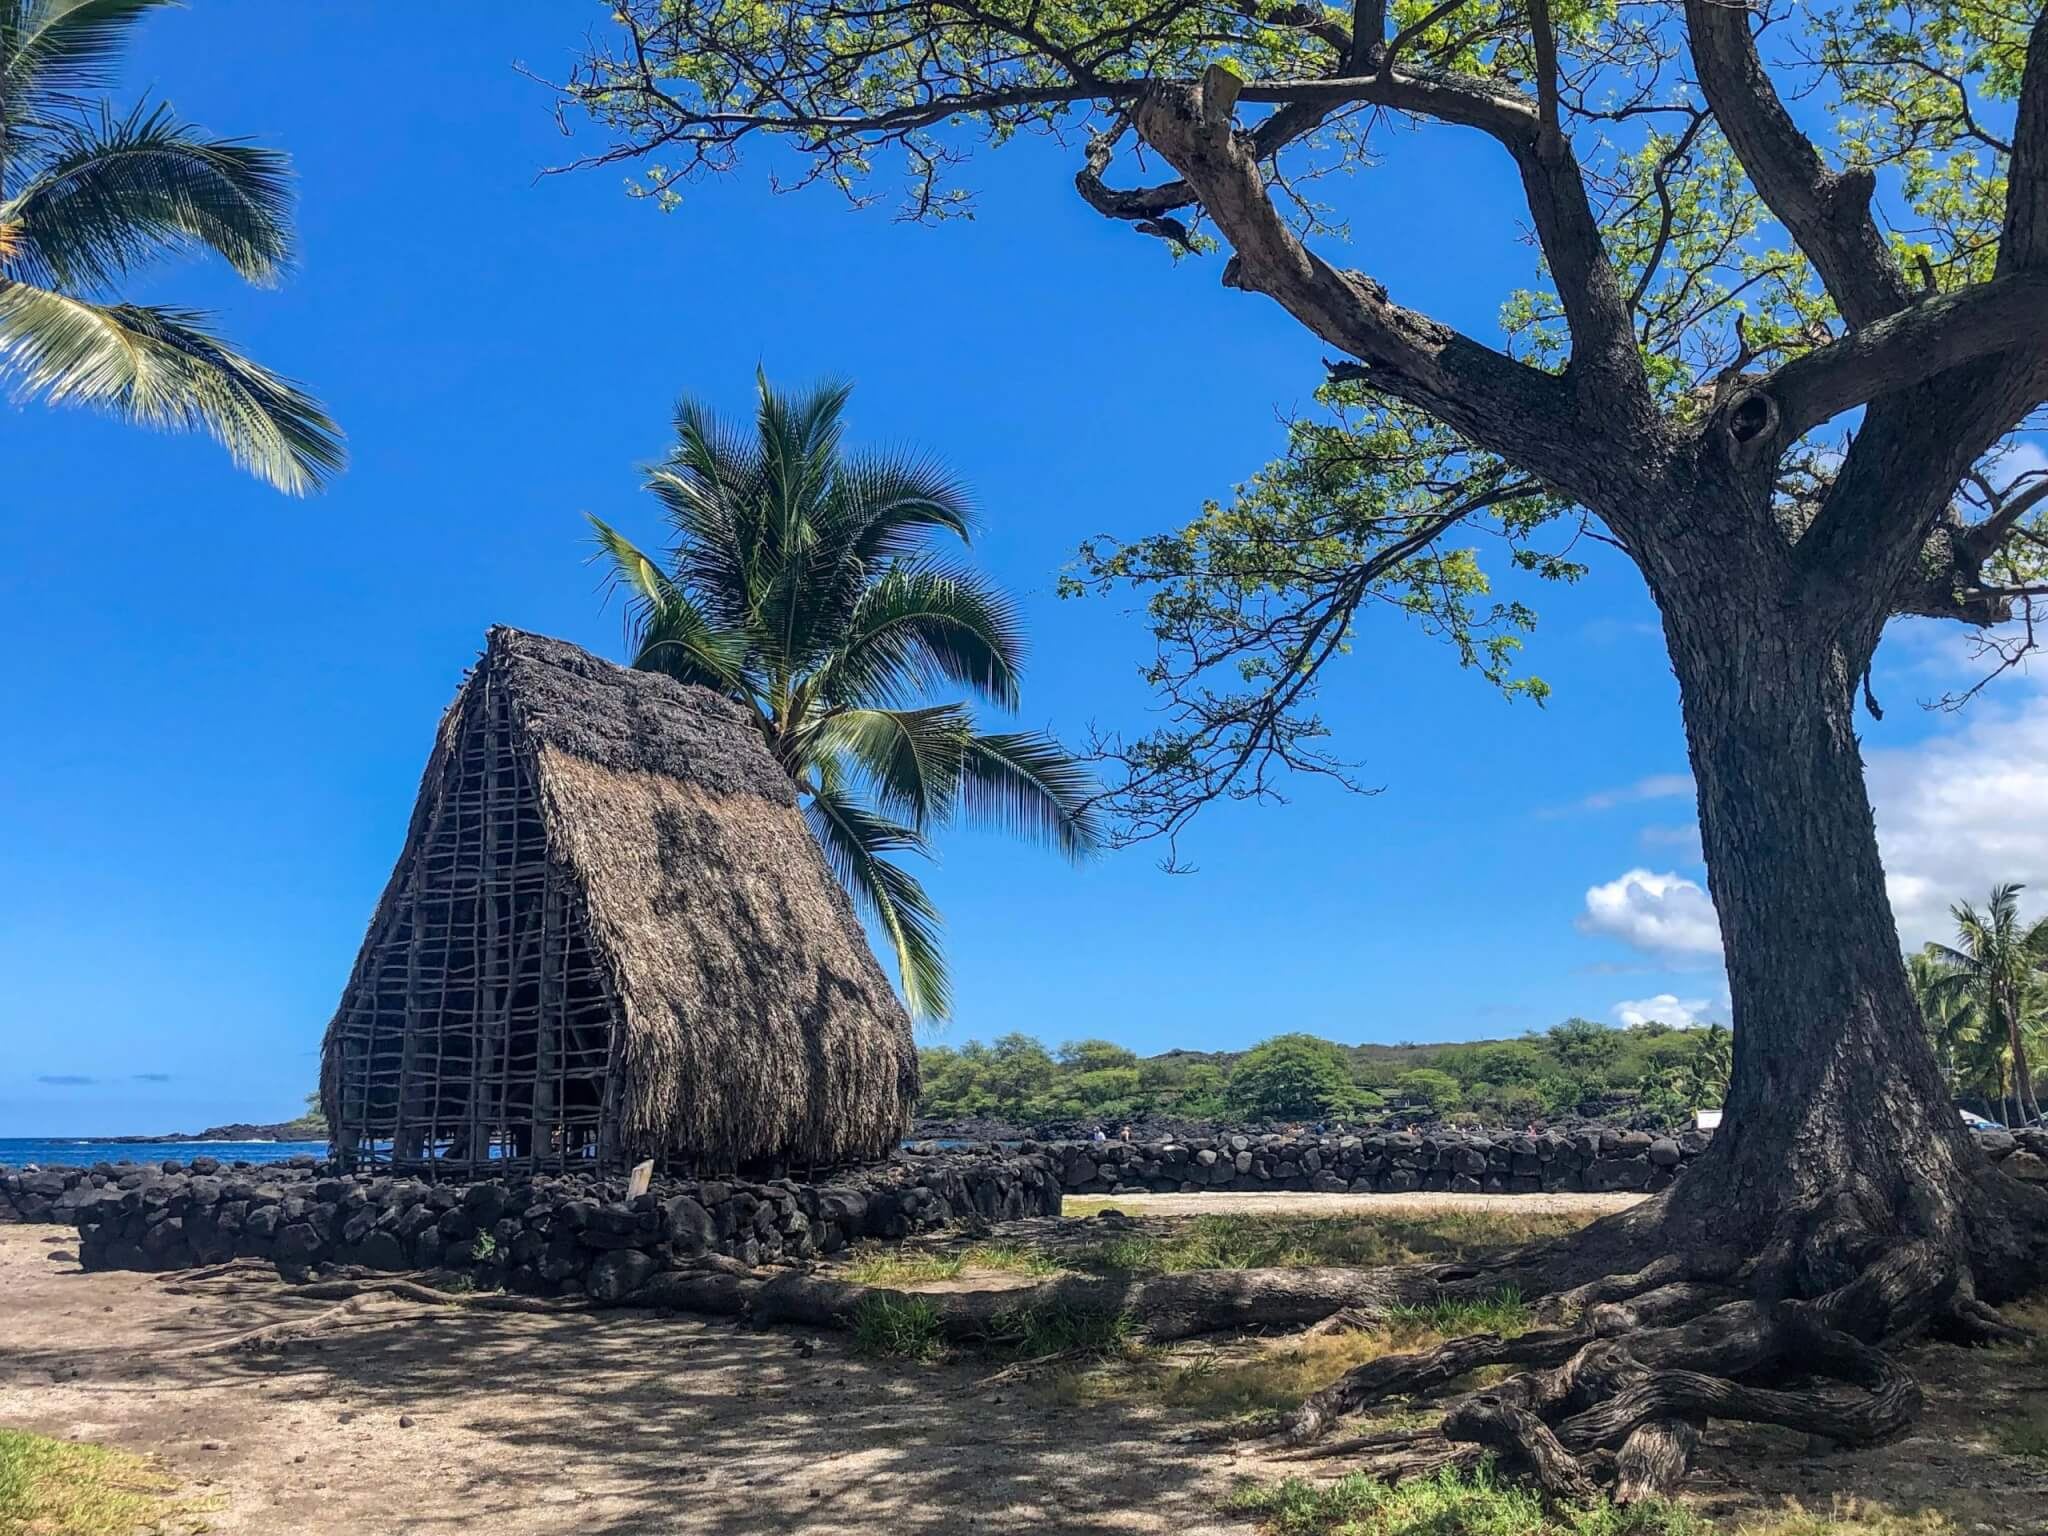 5 Luxurious Hotels On The Big Island Of Hawaii